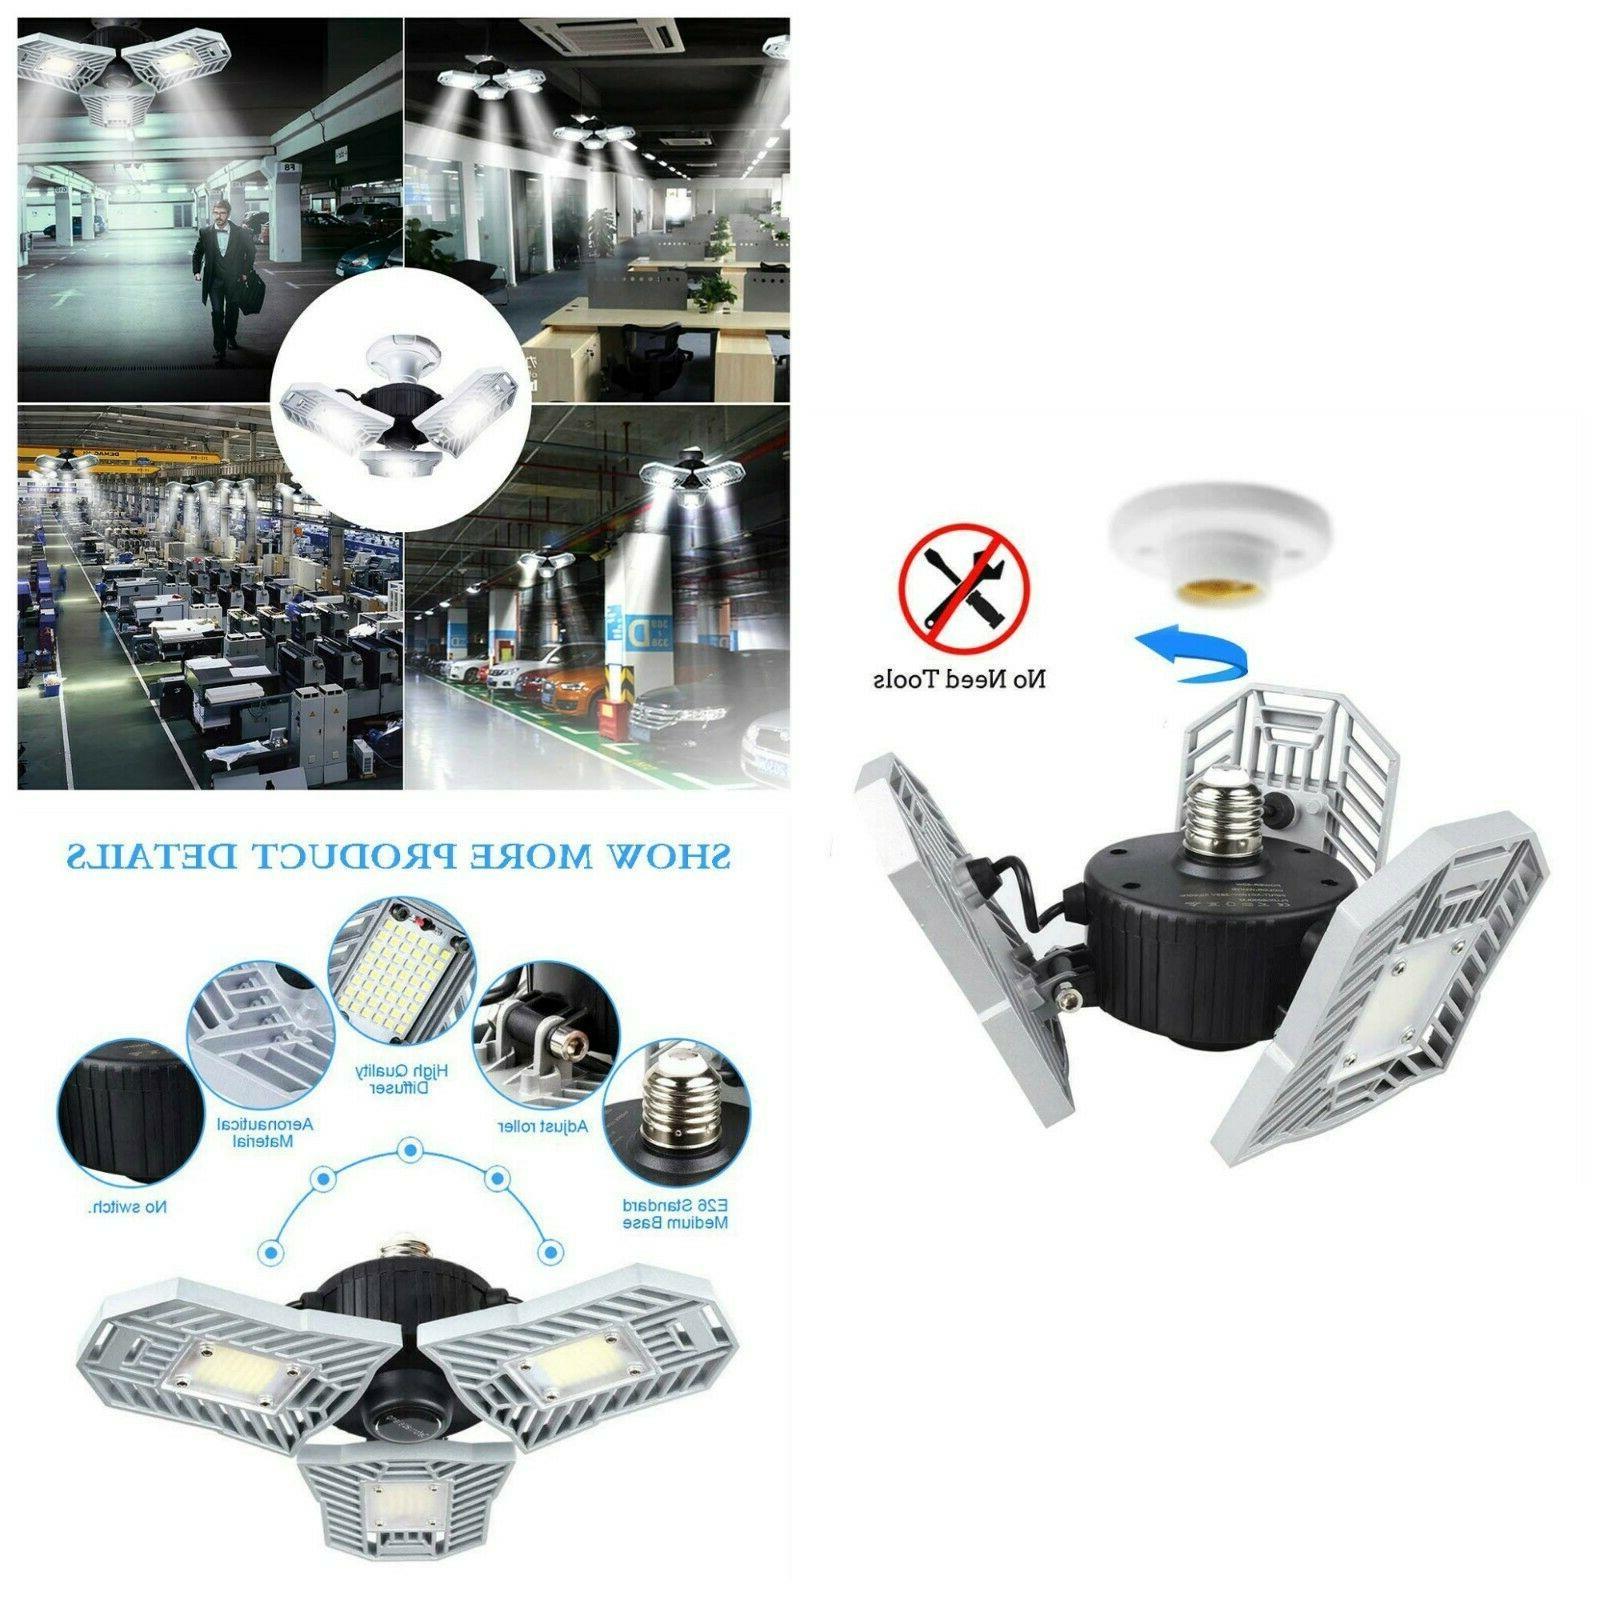 Led Garage Ceiling Light 6000LM 60W Bulb Lights Tools Home I